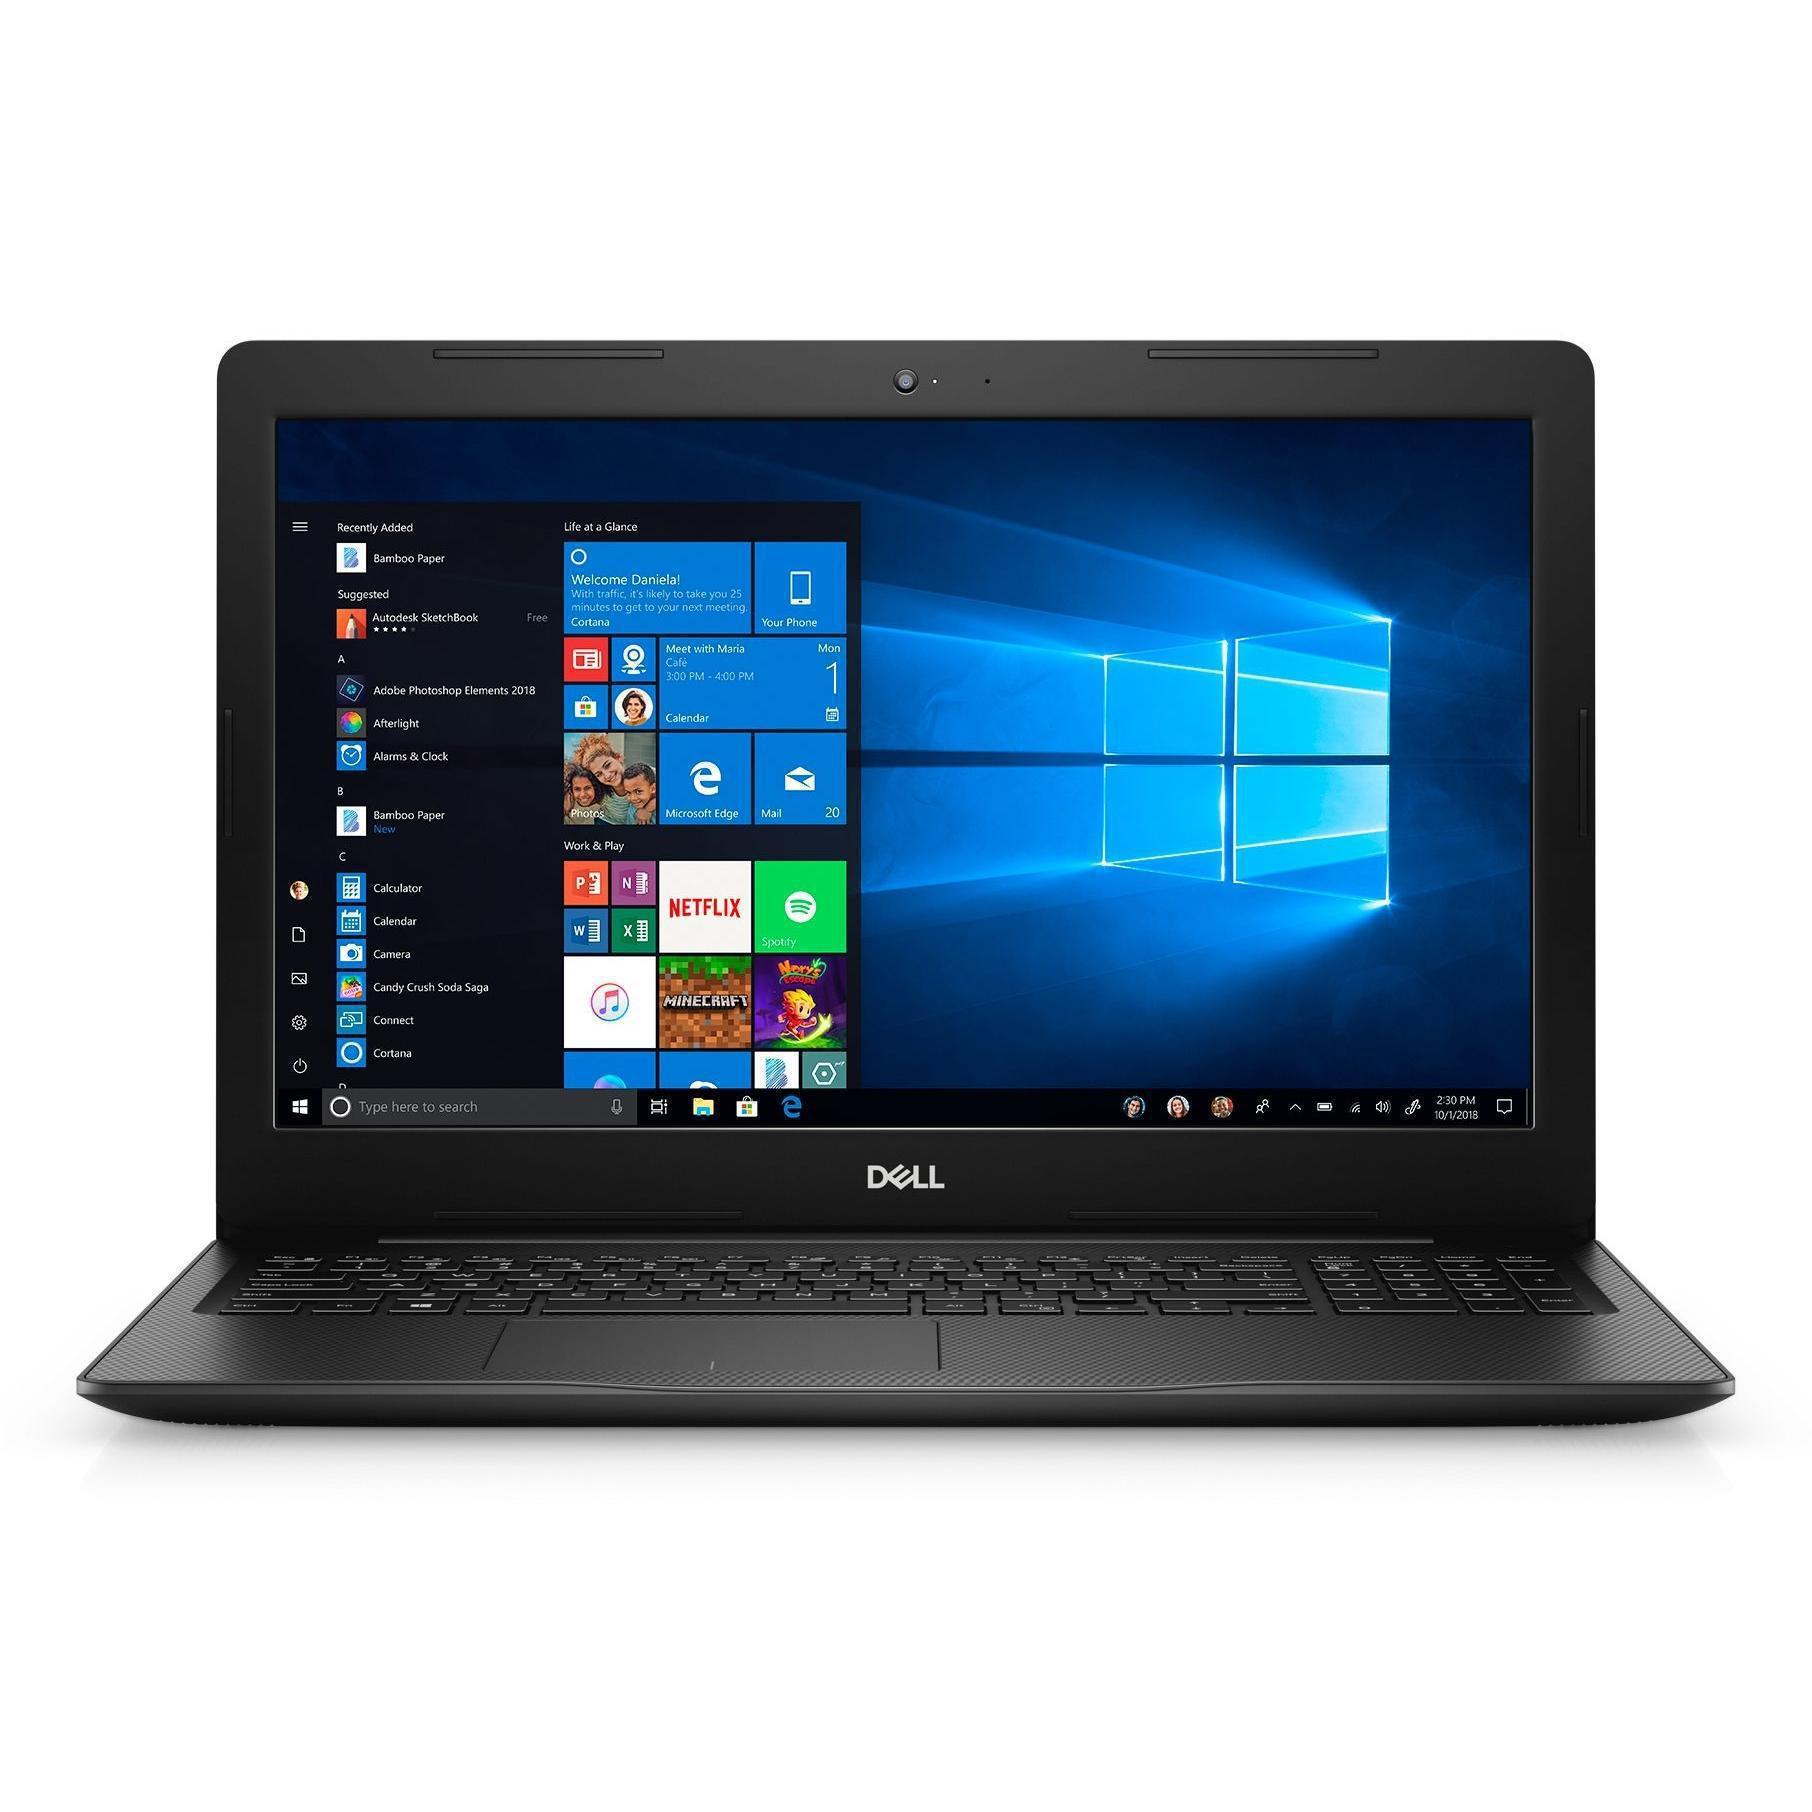 Dell Inspiron 3583 15.6-inch (2018) - Core i5-8265U - 8 GB  - HDD 1 TB